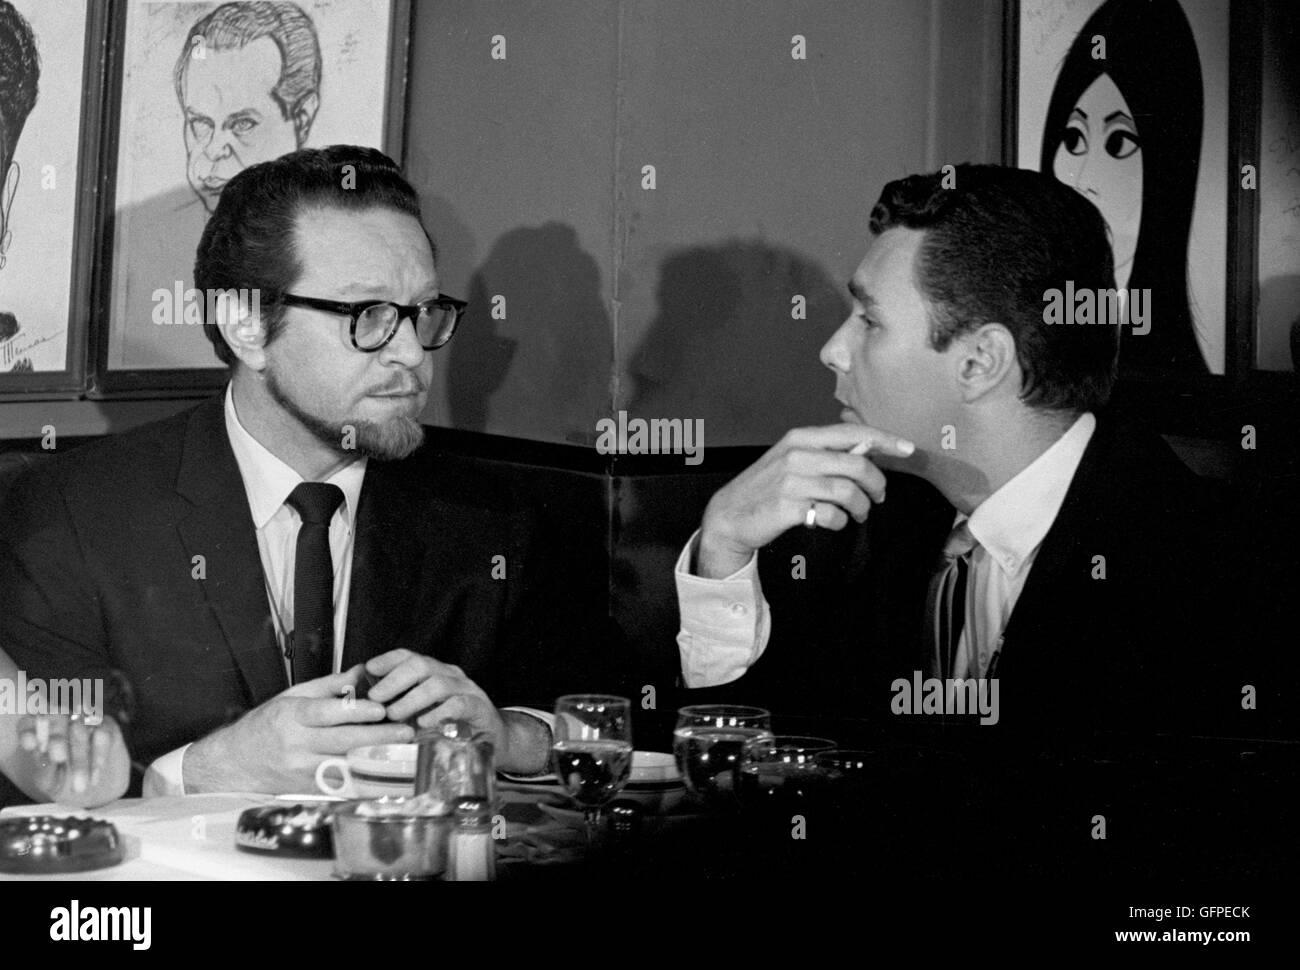 Les Crane and Alfred Drake at Sardi's Restaurant in midtown Manhattan. - Stock Image